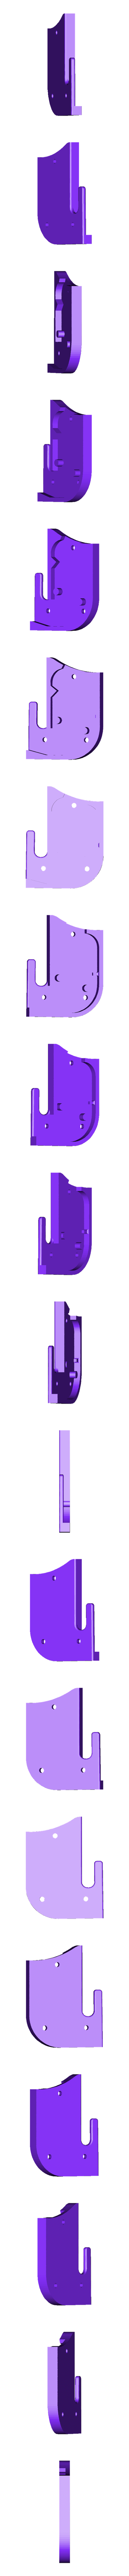 1.stl Download free STL file Fire trigger for mobile games • 3D printable object, EliGreen